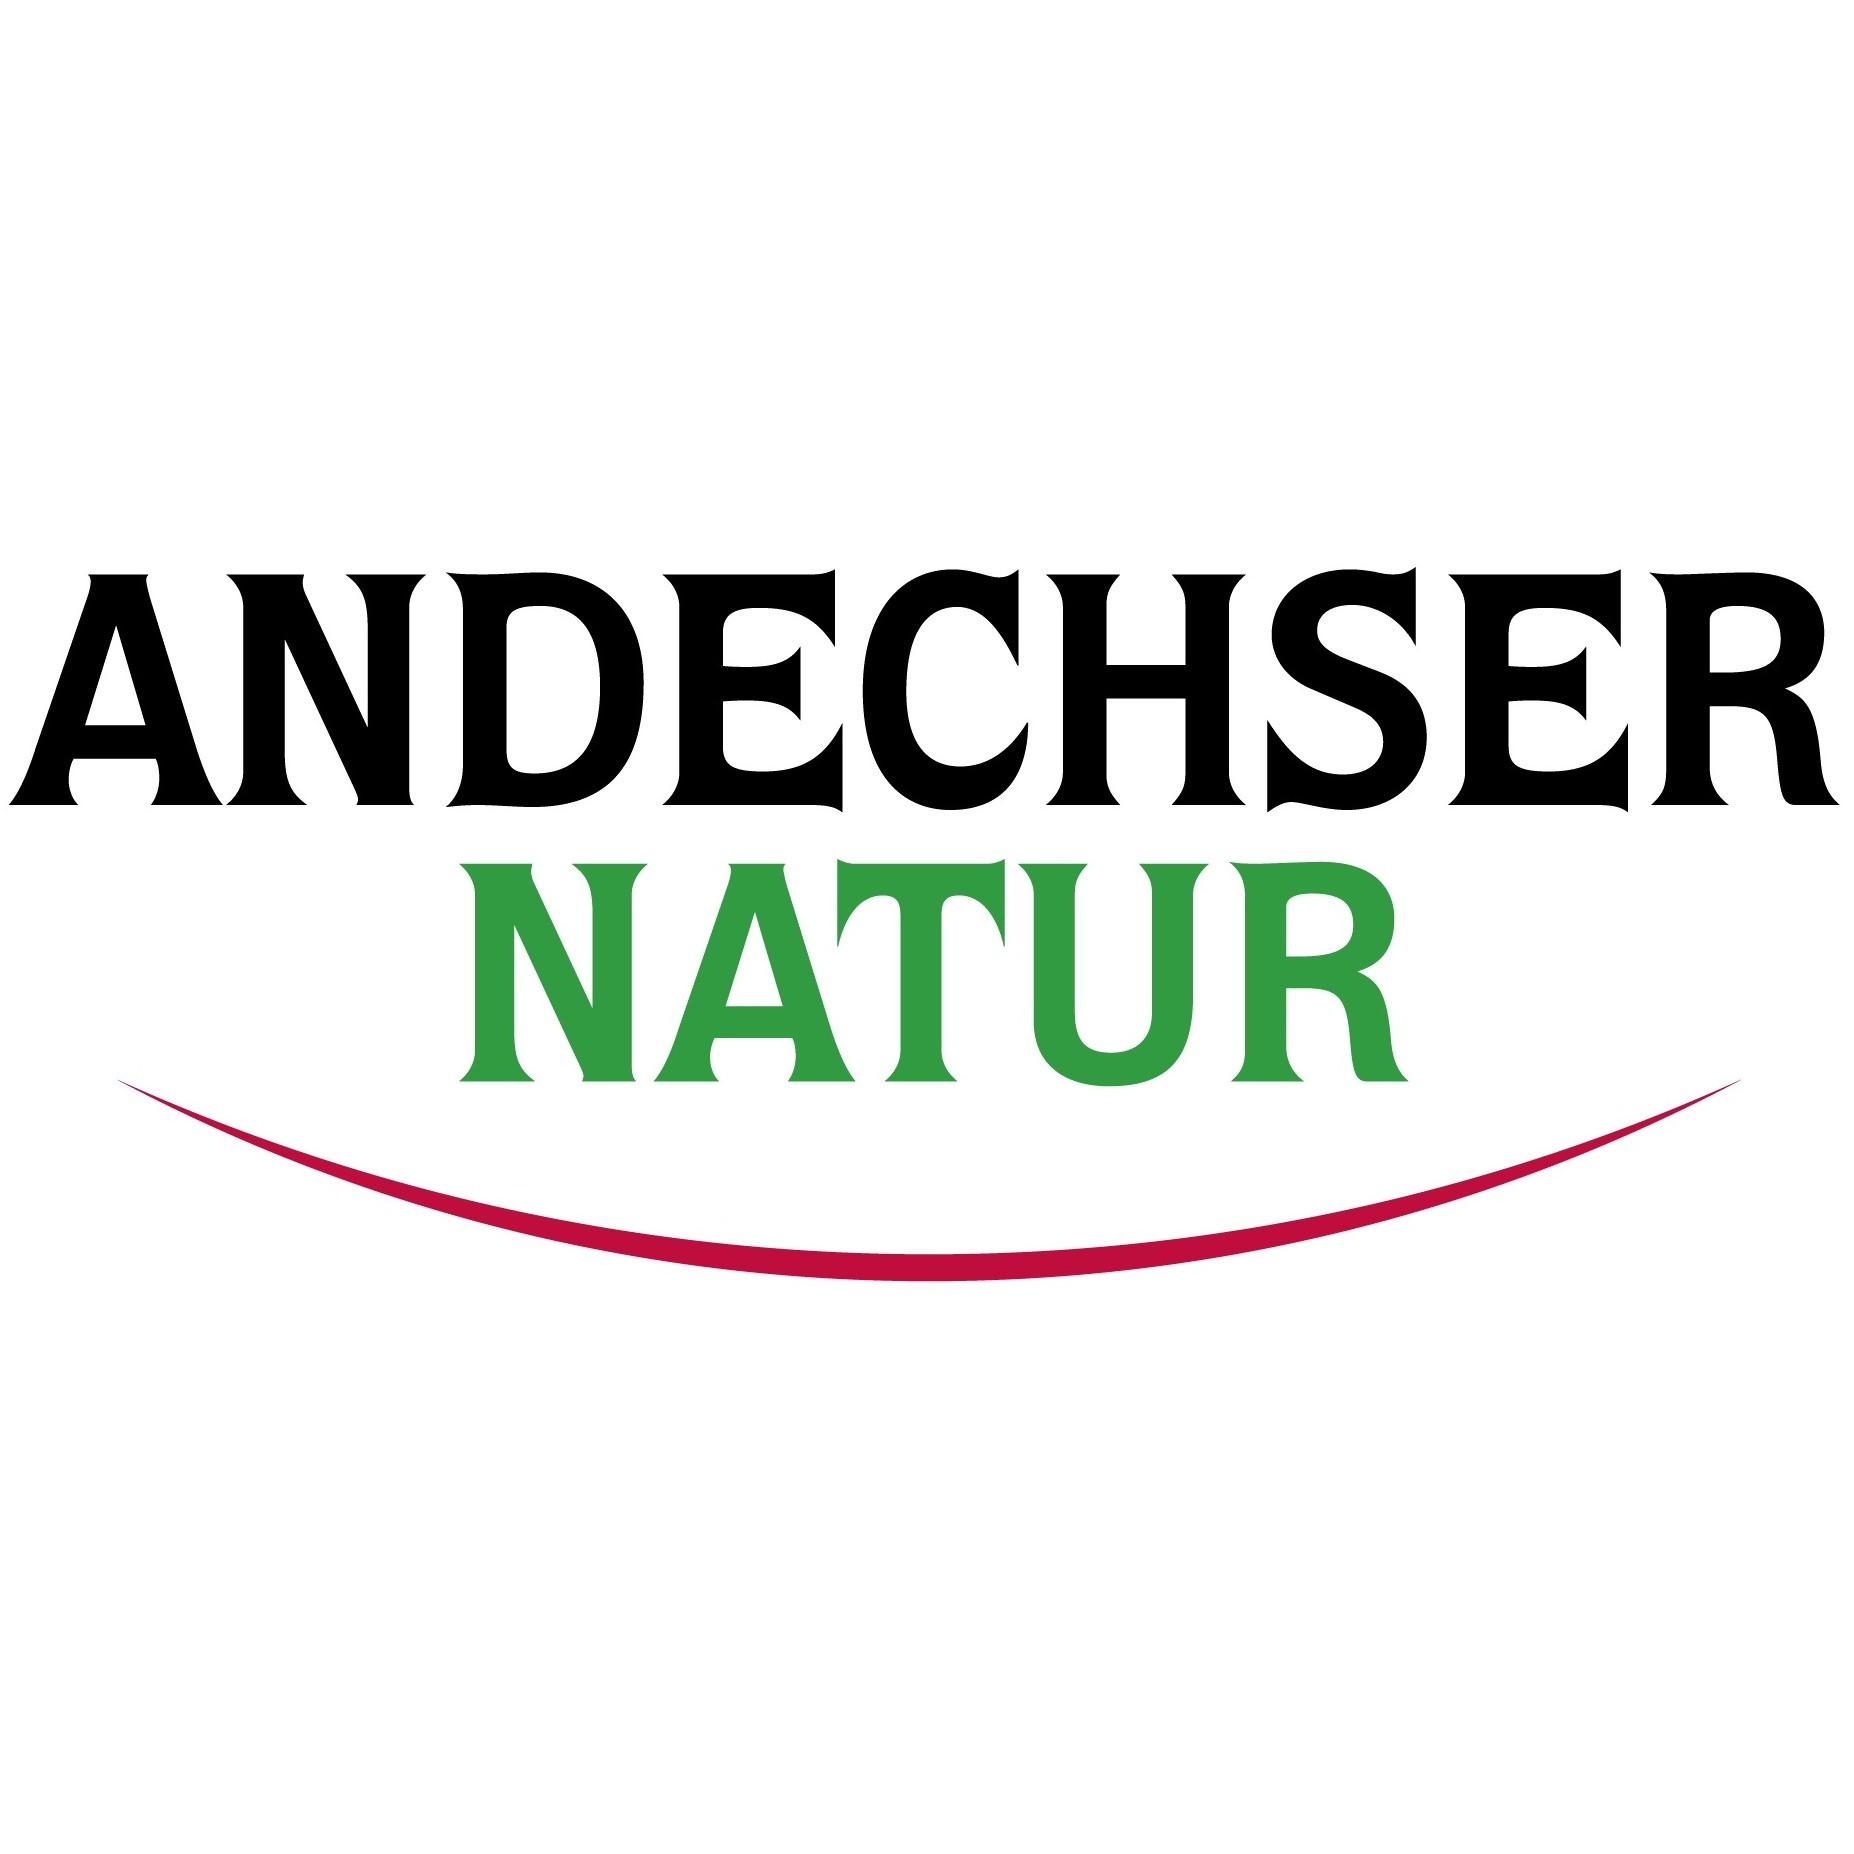 Produse Andechser Natur din oferta Nourish BioMarket